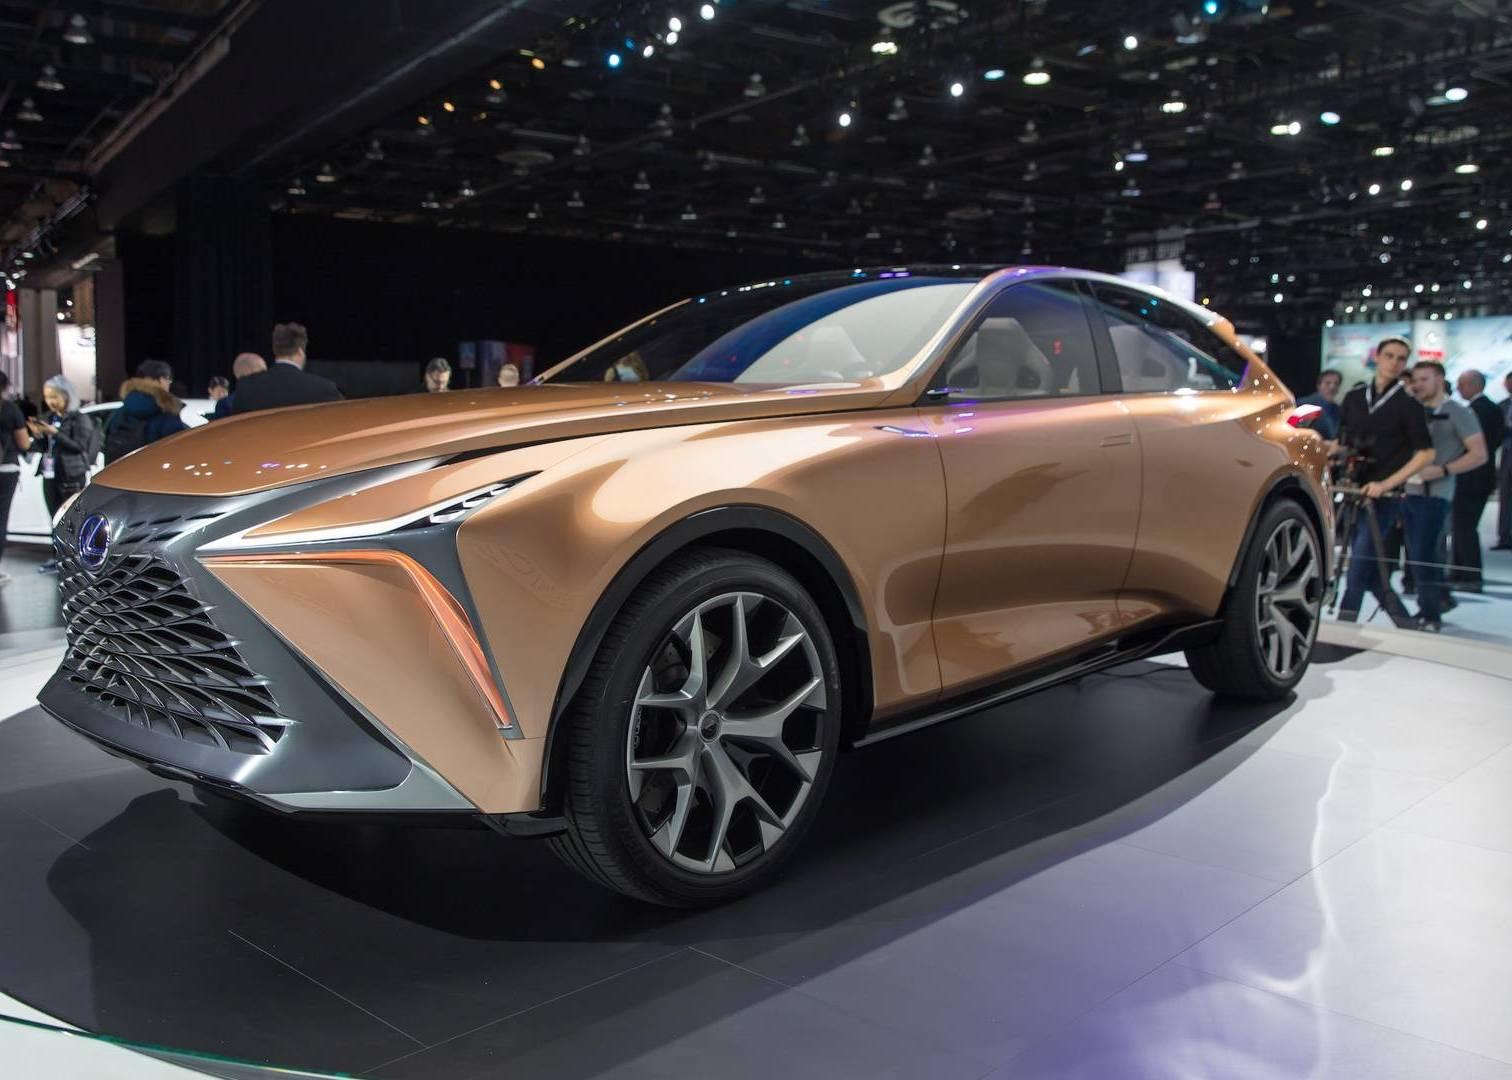 2022 Lexus LQ Release Date